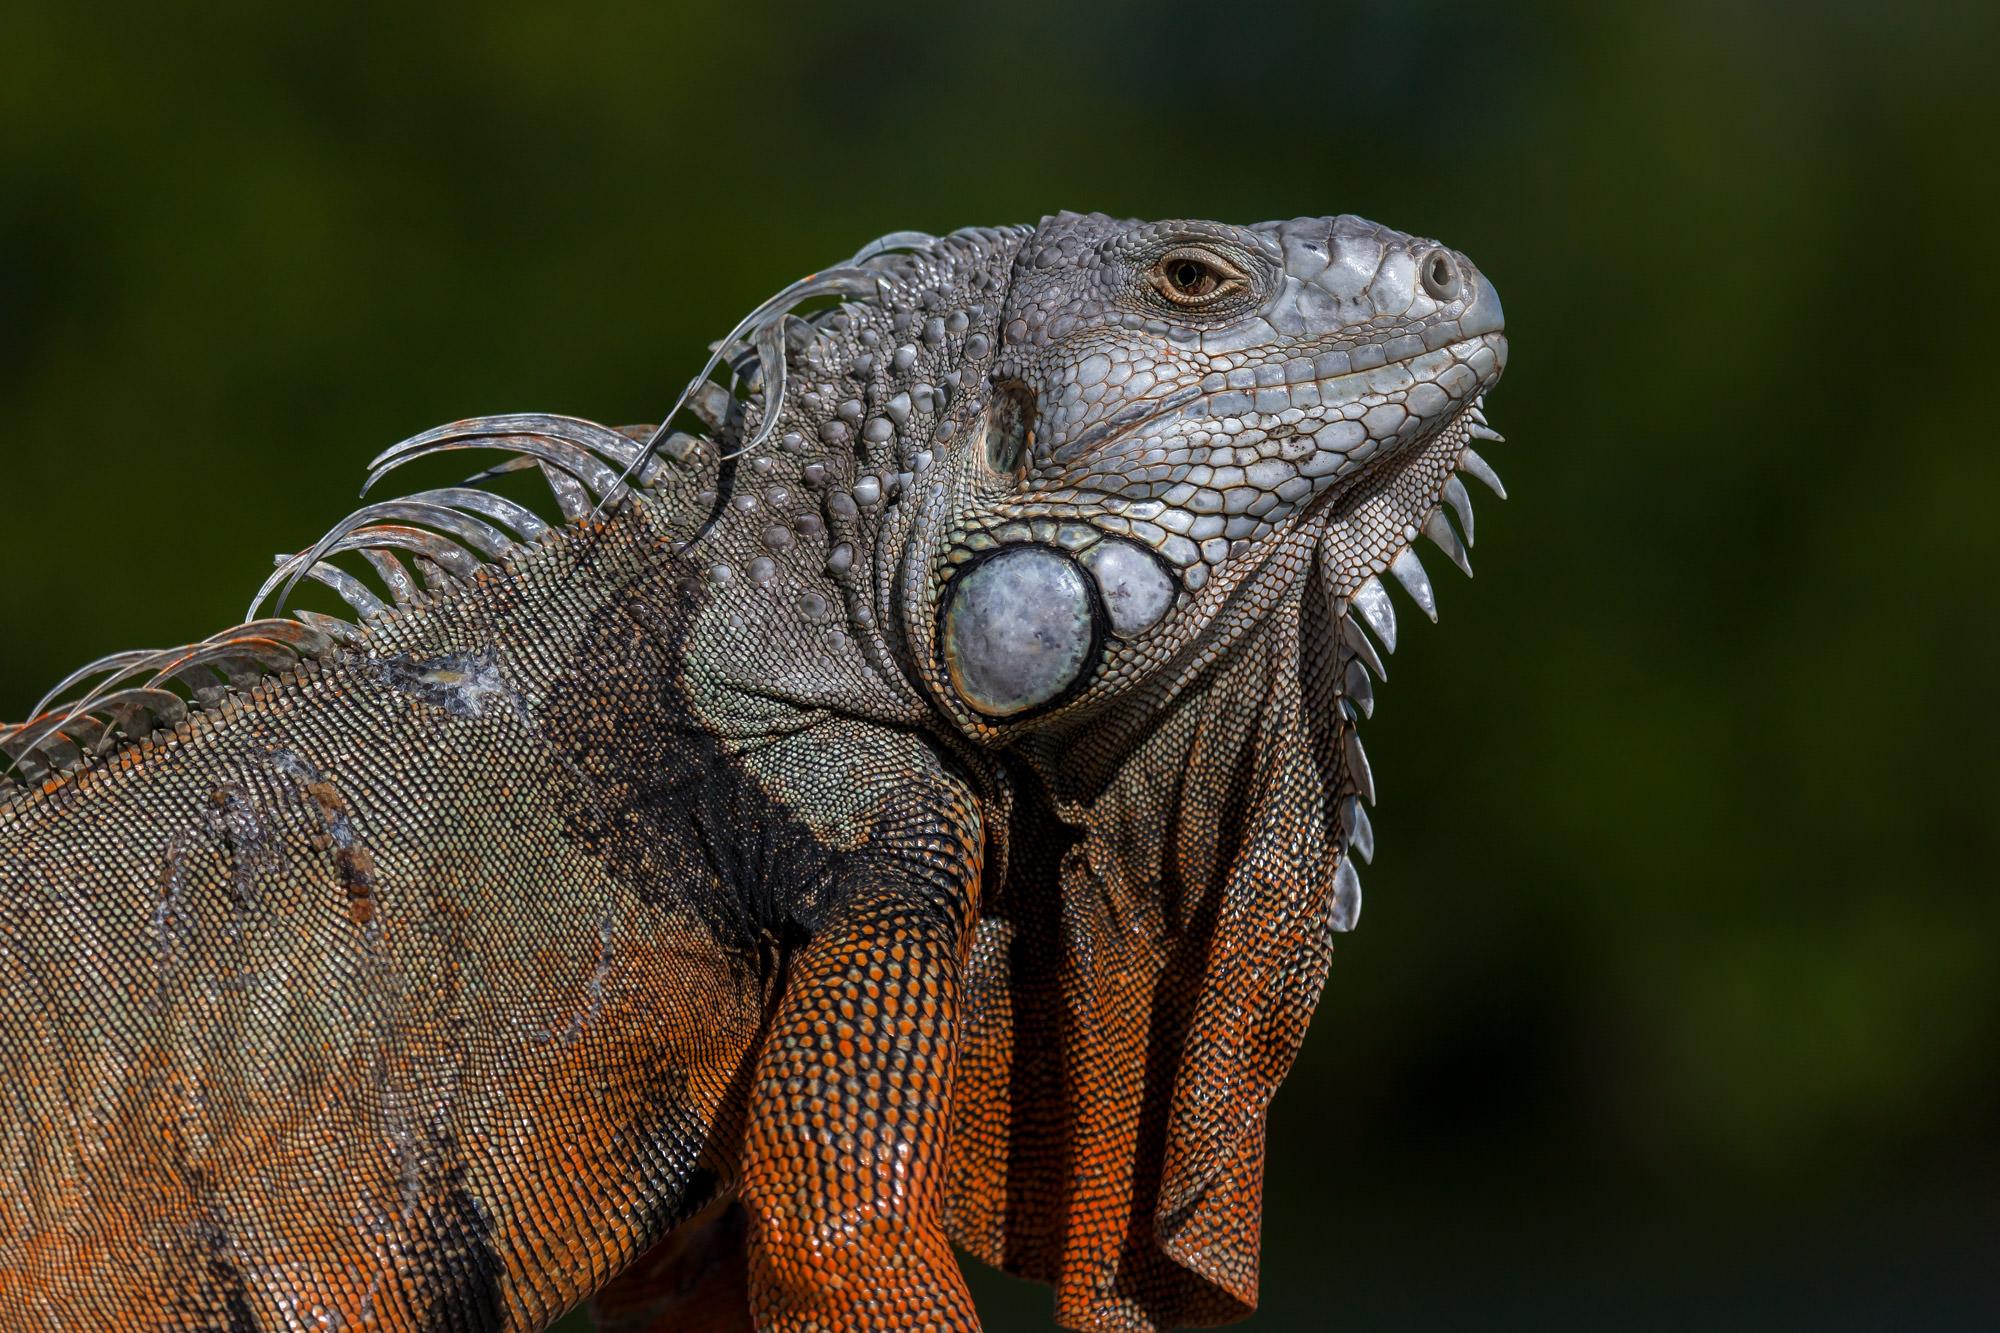 Iguana, Florida, limited edition, photograph, fine art, wildlife, photo